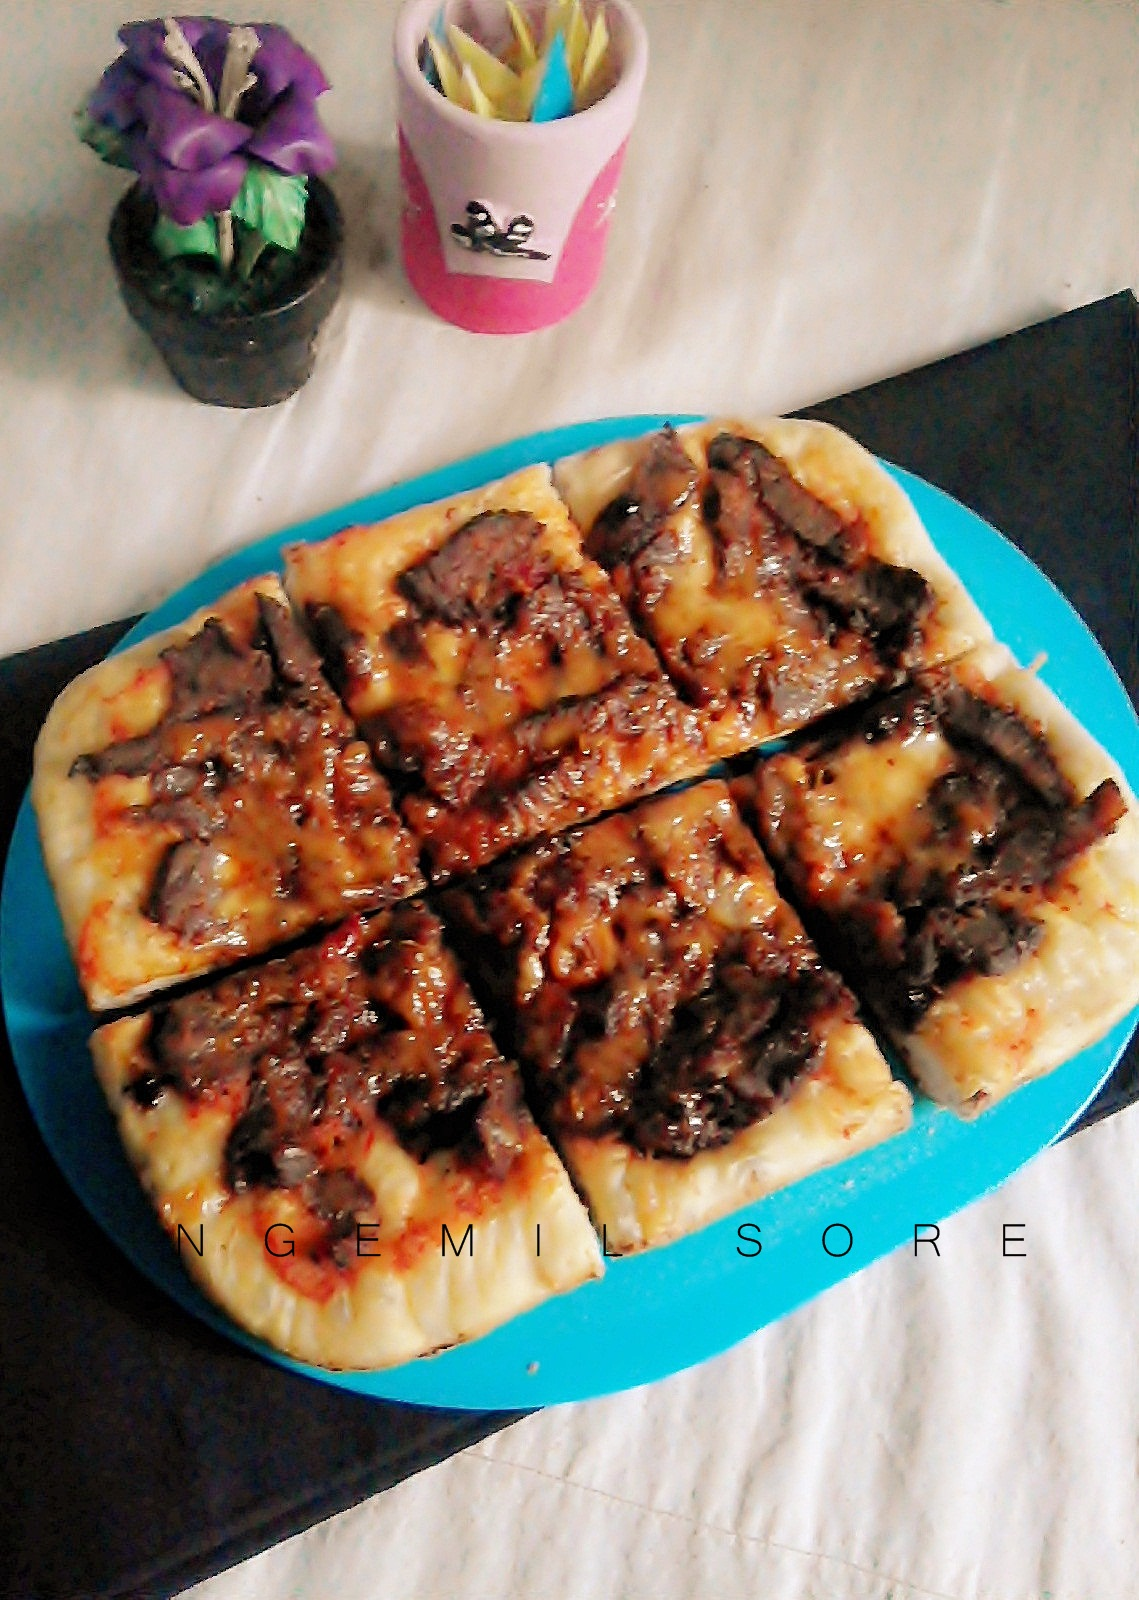 Resep Pizza Bbq Daging Sapi Ngemil Sore